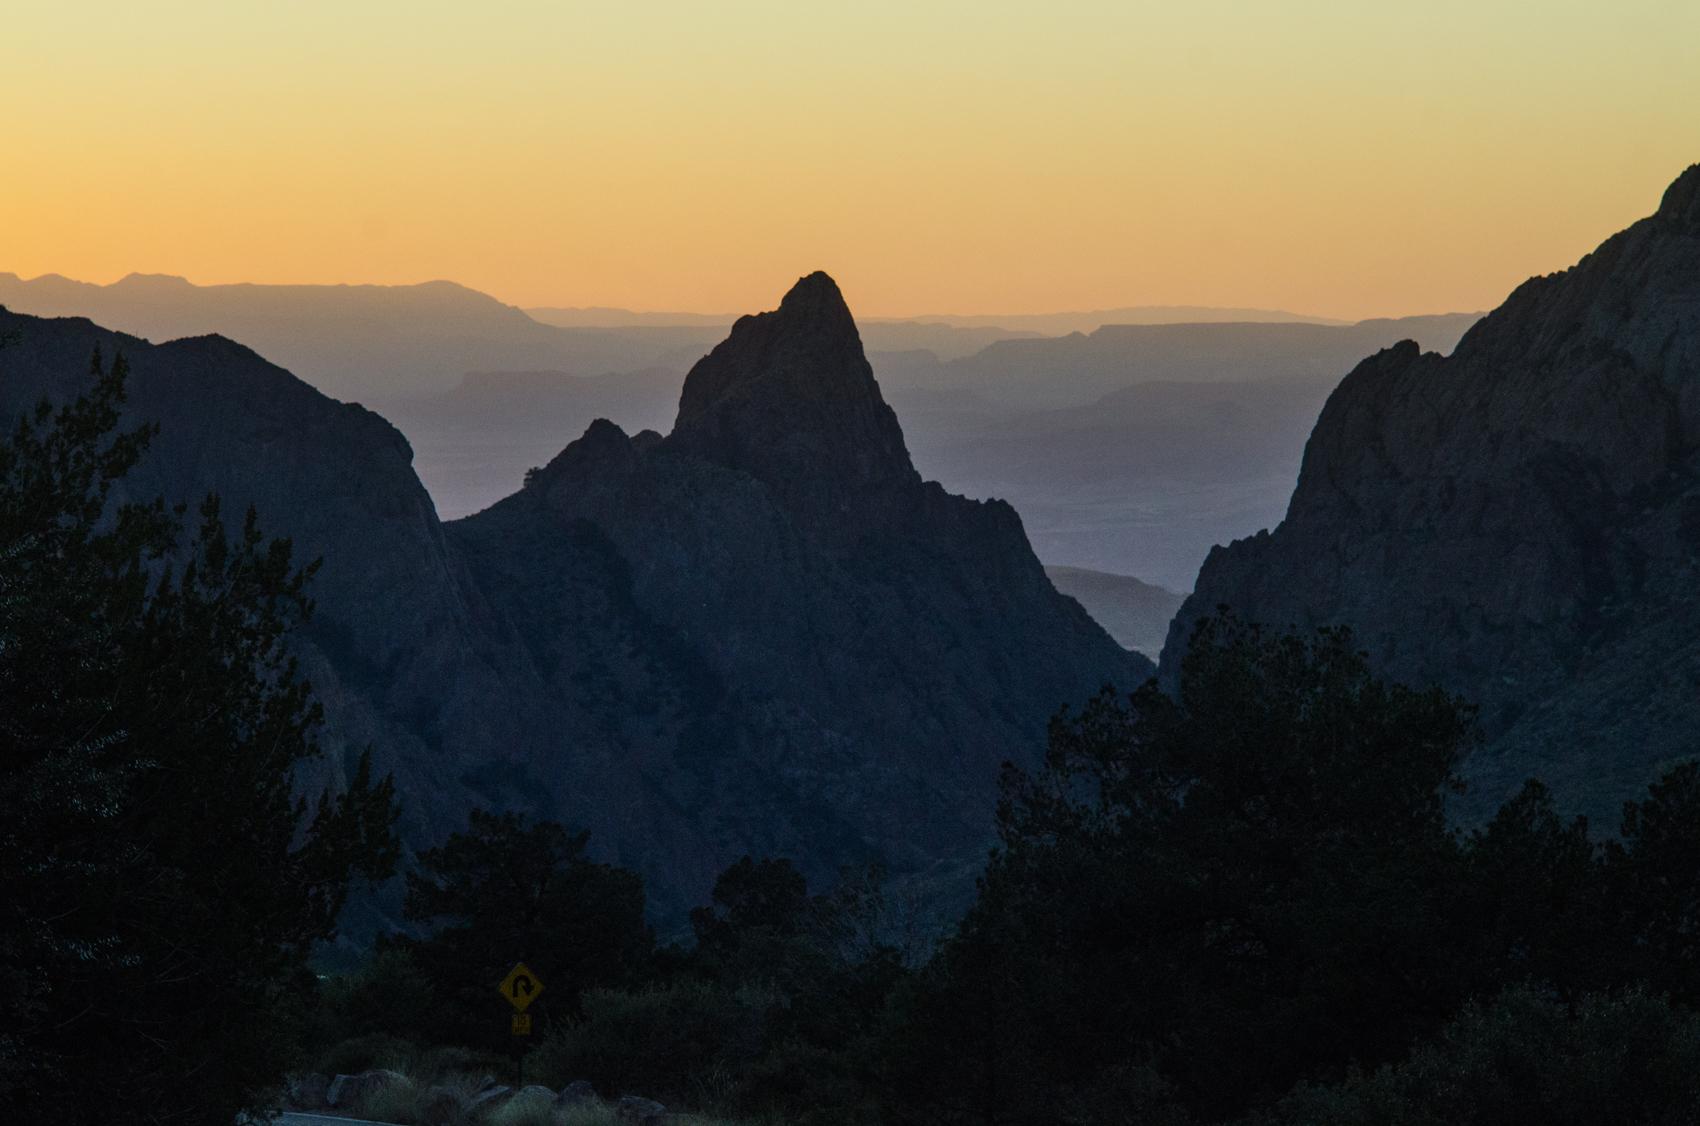 Mountain biking in big bend national park-leh cycling goods-7.jpg